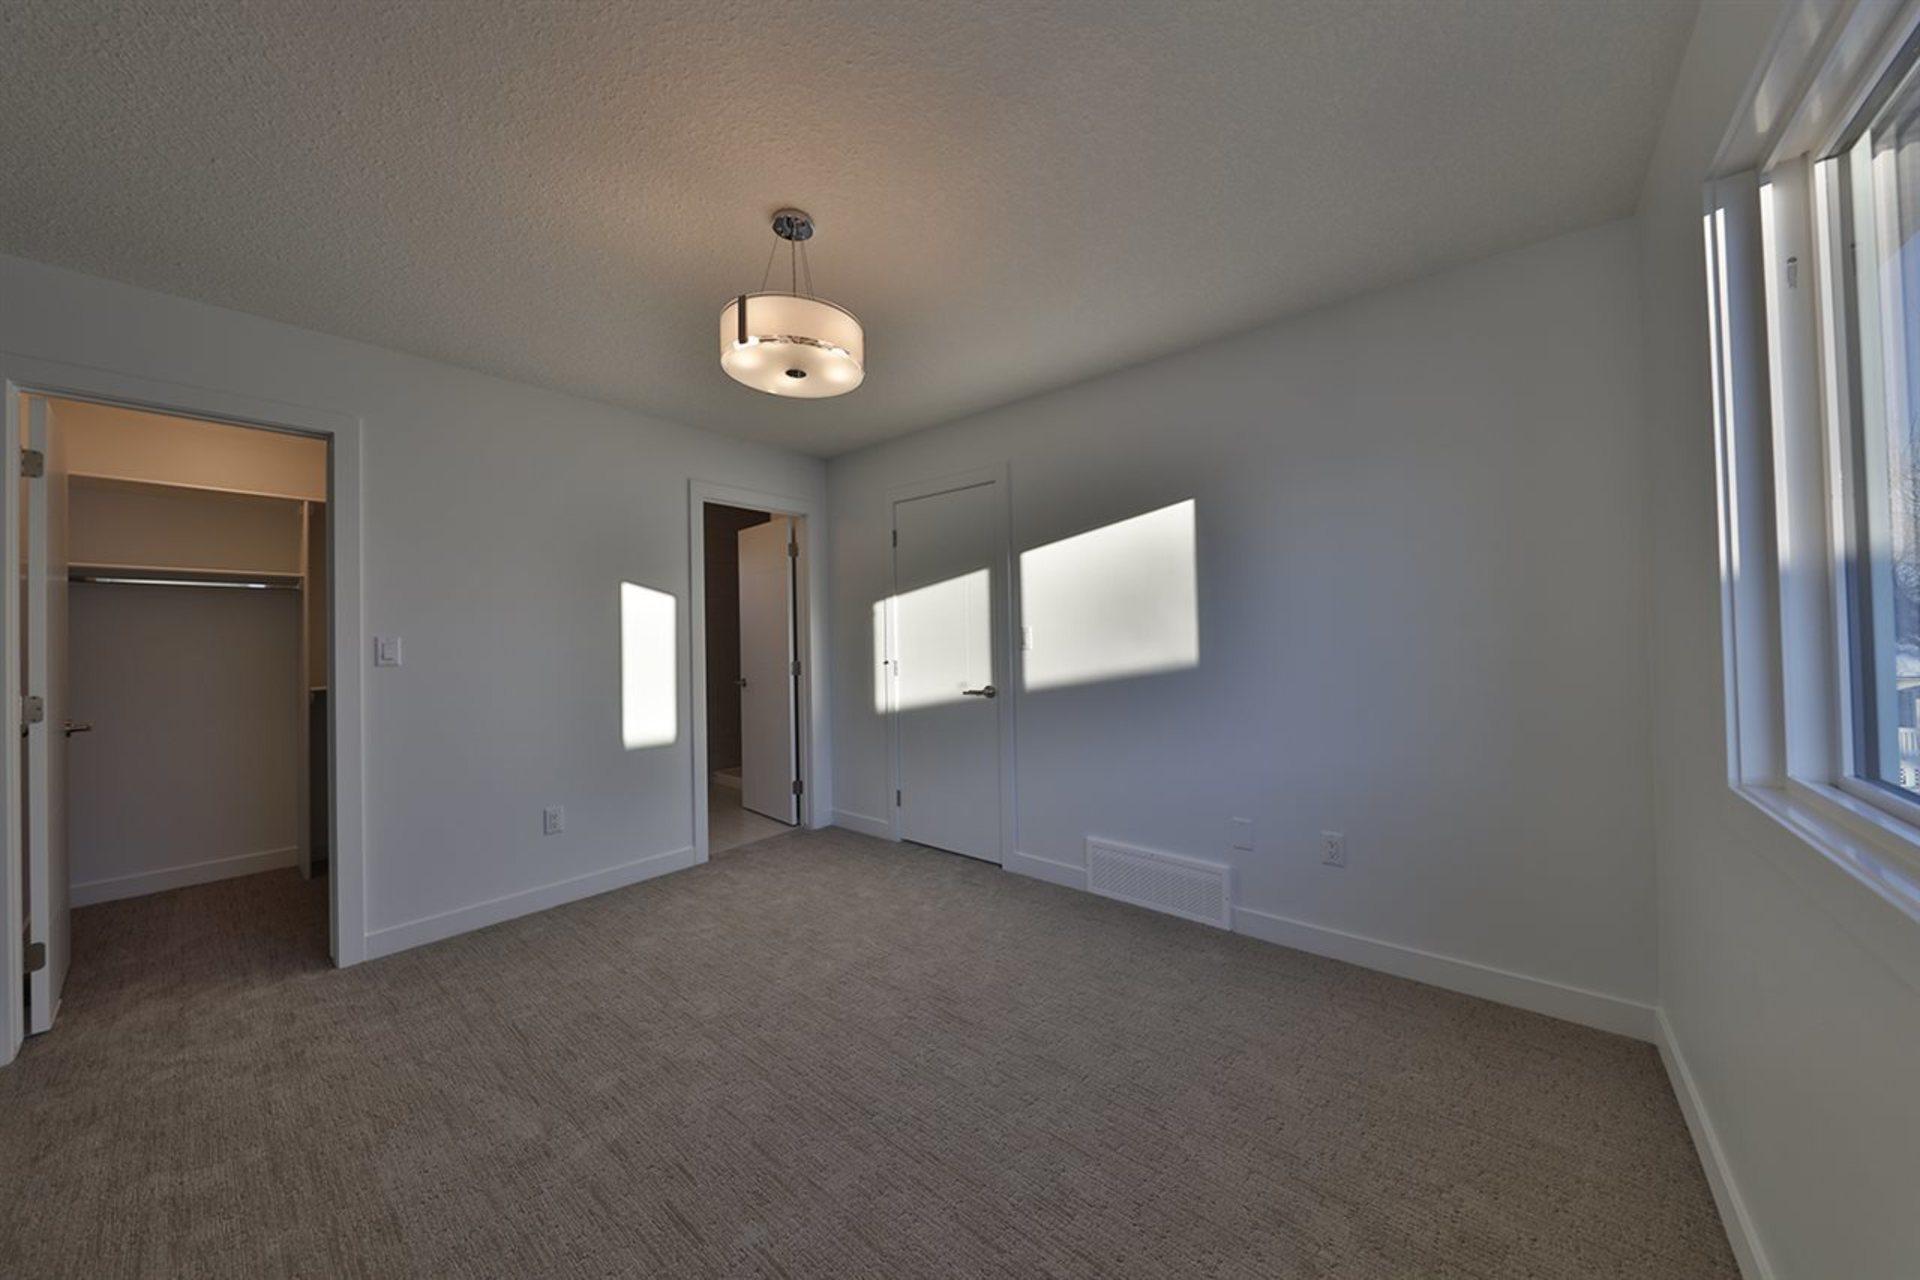 11636-84-street-parkdale_edmo-edmonton-12 at 11636 84 Street, Parkdale_EDMO, Edmonton